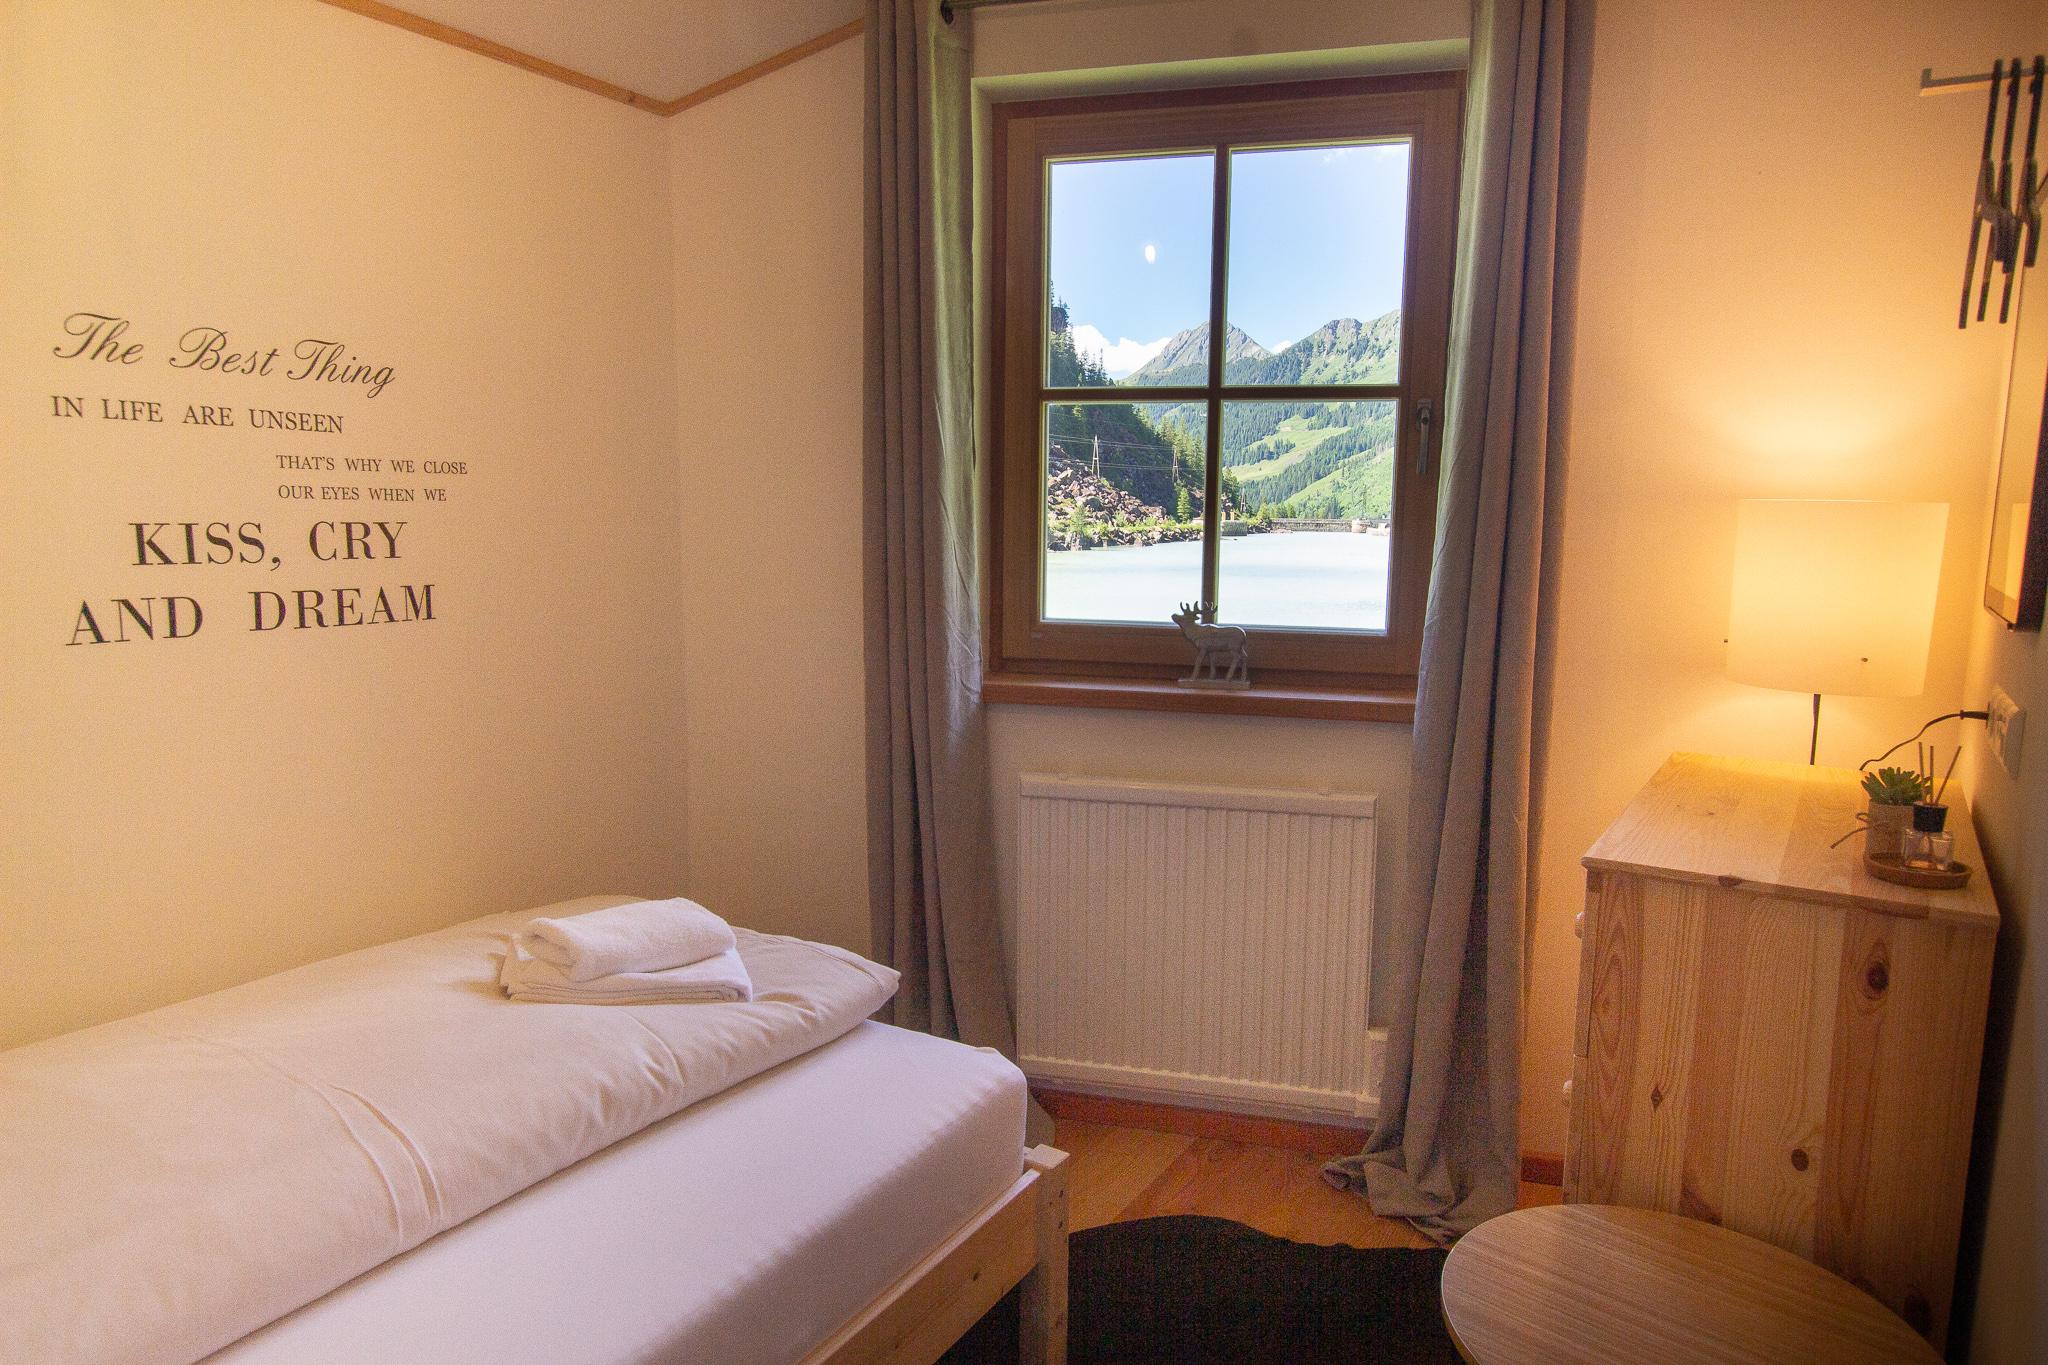 Maison de vacances Lodge Seeblick am Skilift und Bergsee für 5 (2636751), Uttendorf, Pinzgau, Salzbourg, Autriche, image 15